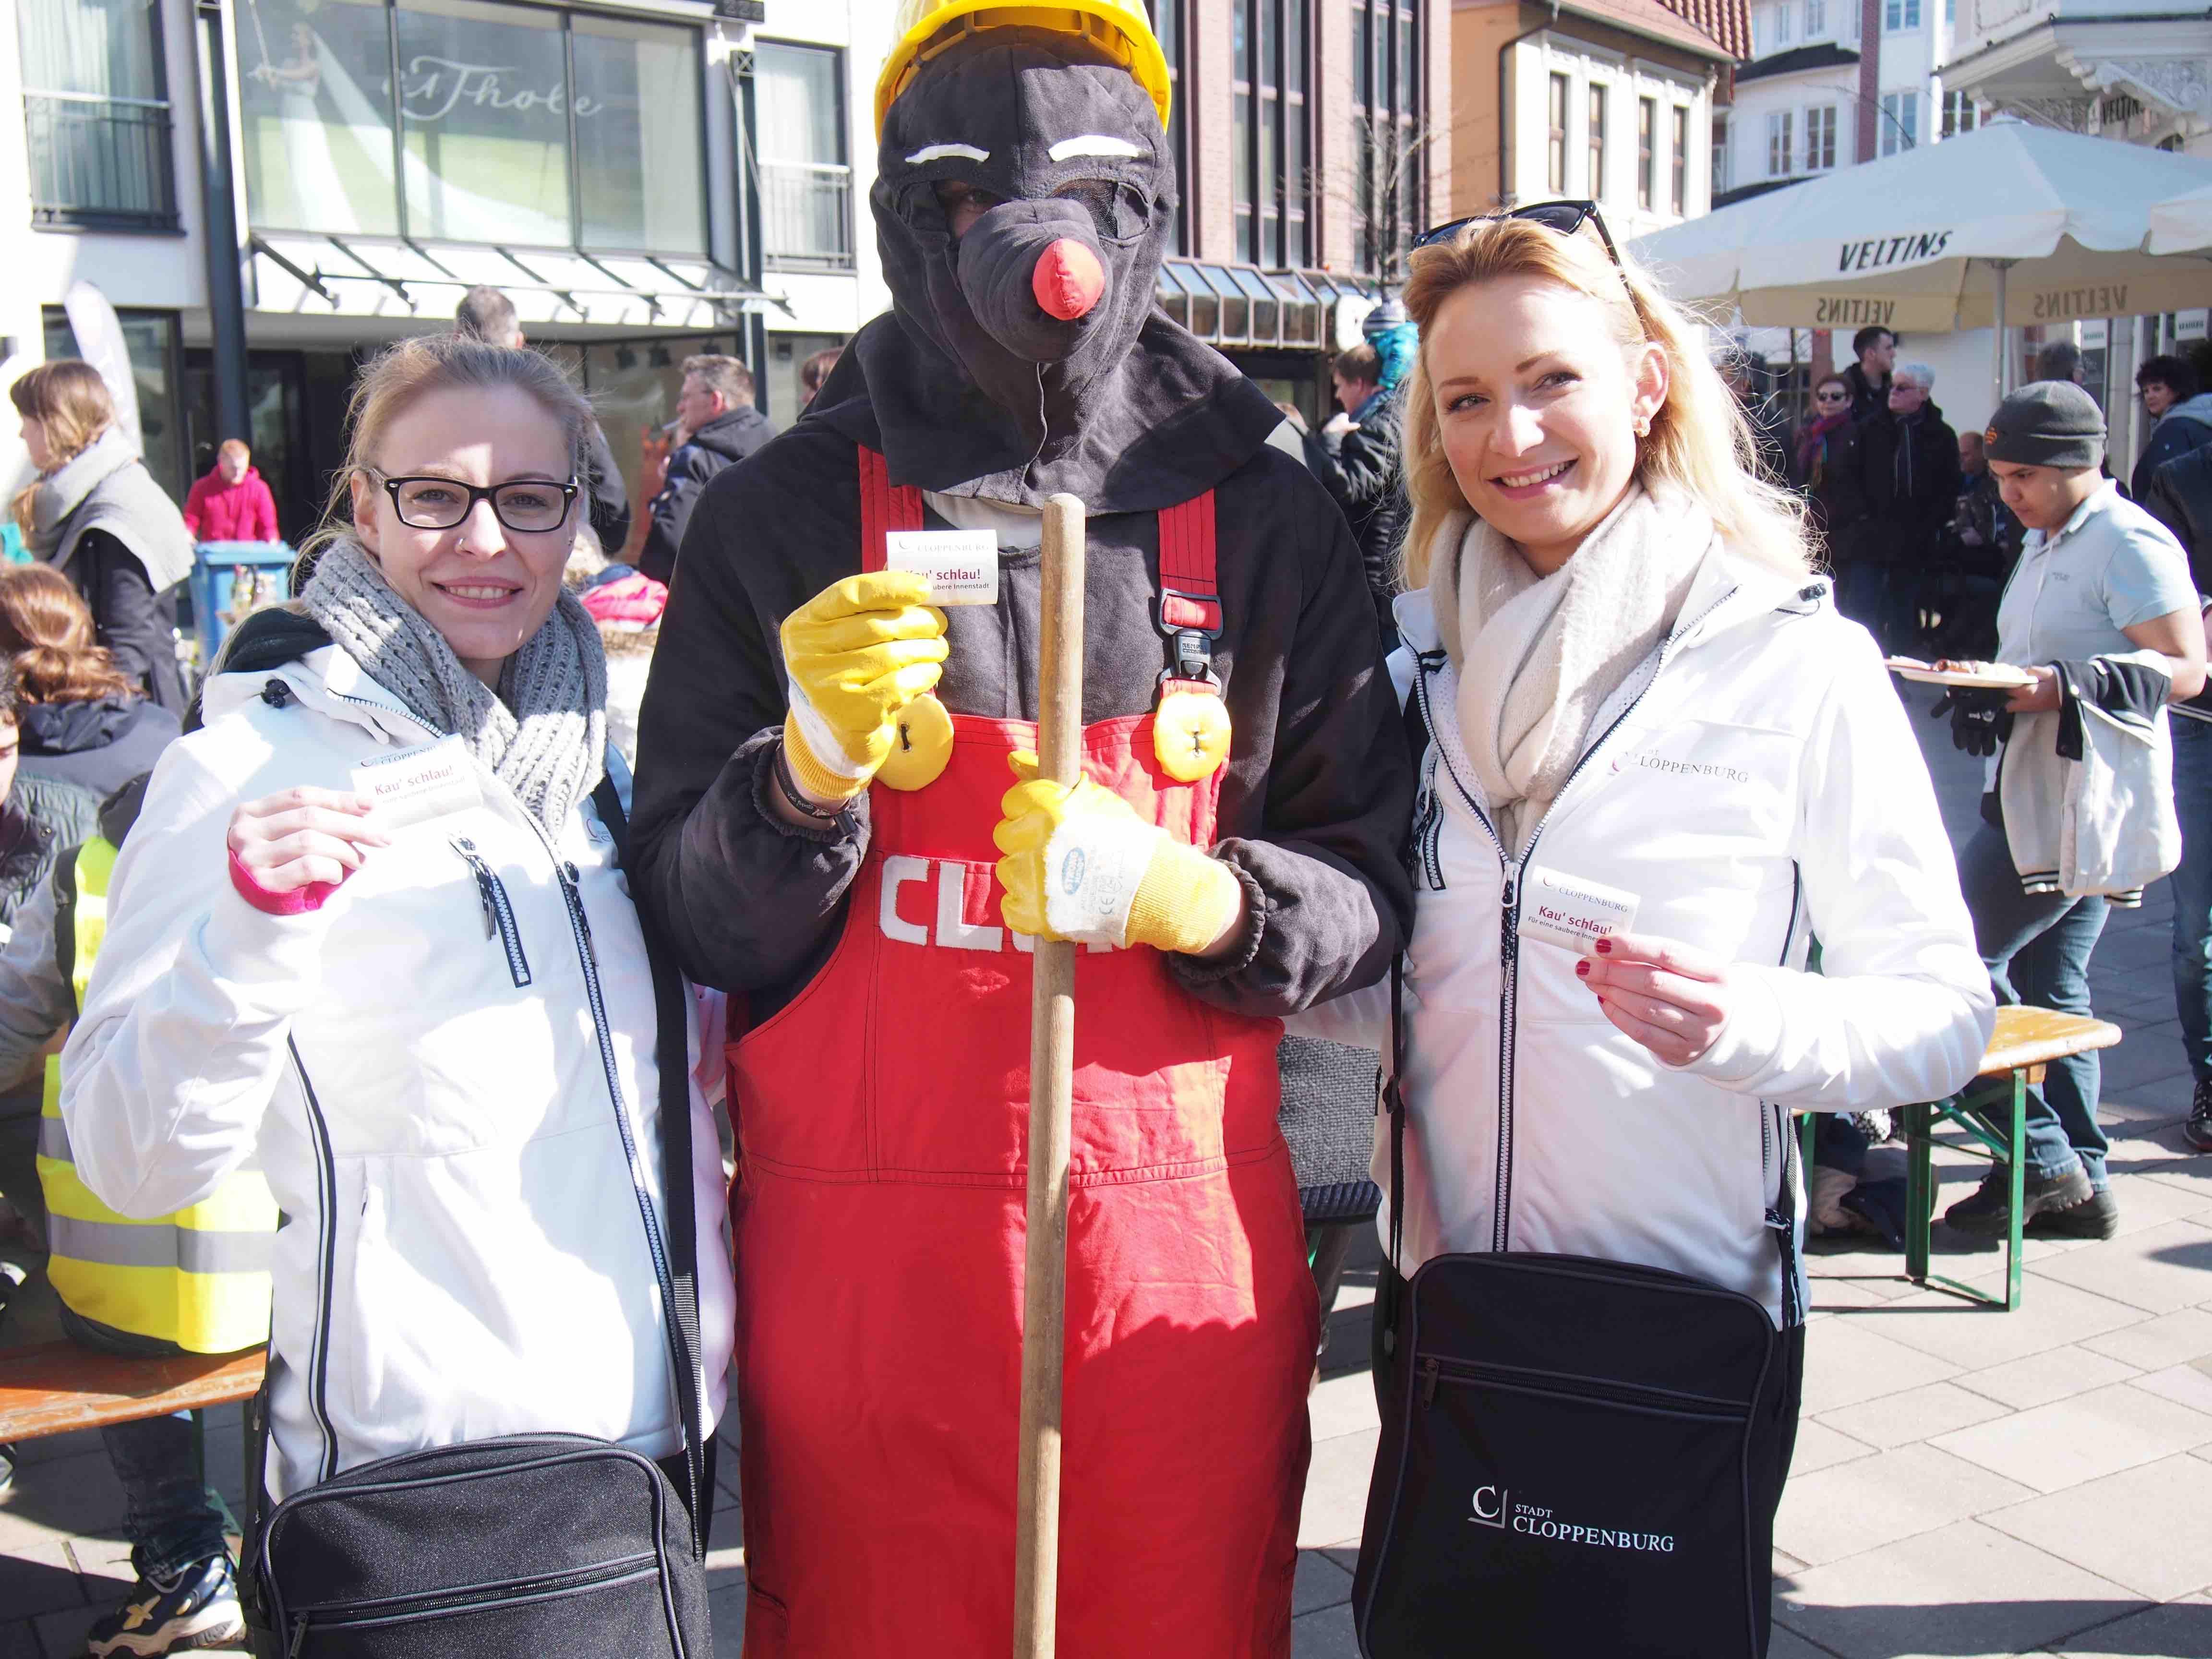 Gegen Littering/Verschmutzung durch Kaugummis Stadt Cloppenburg Group